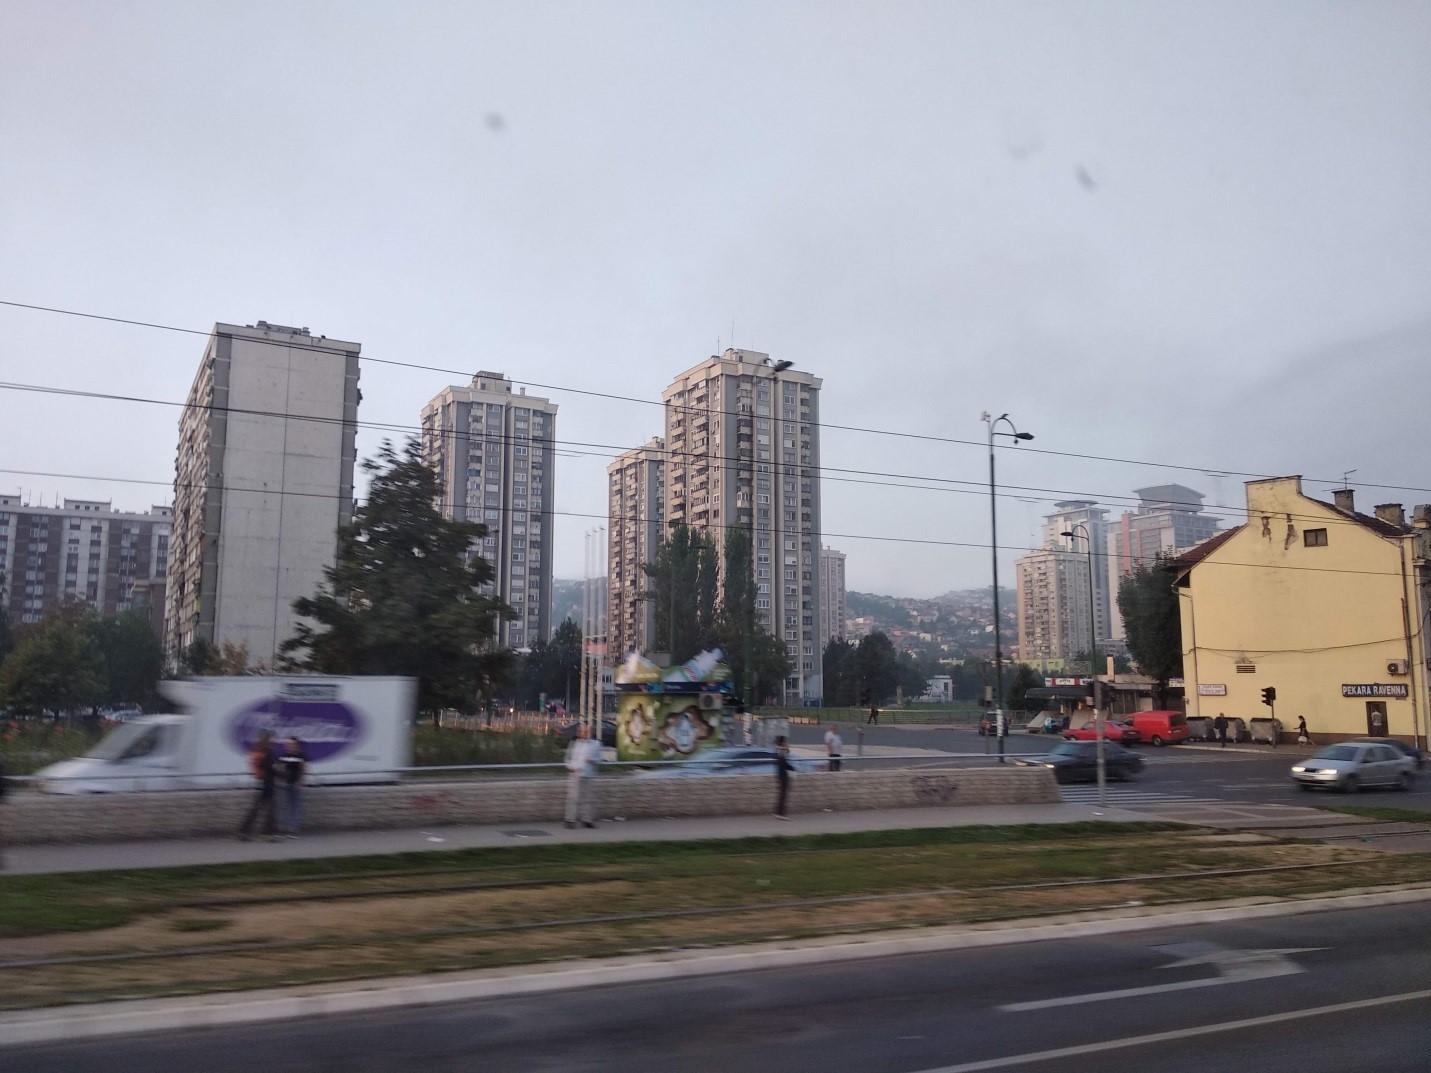 Tram tracks running from Sarajevo center through the Otoka district